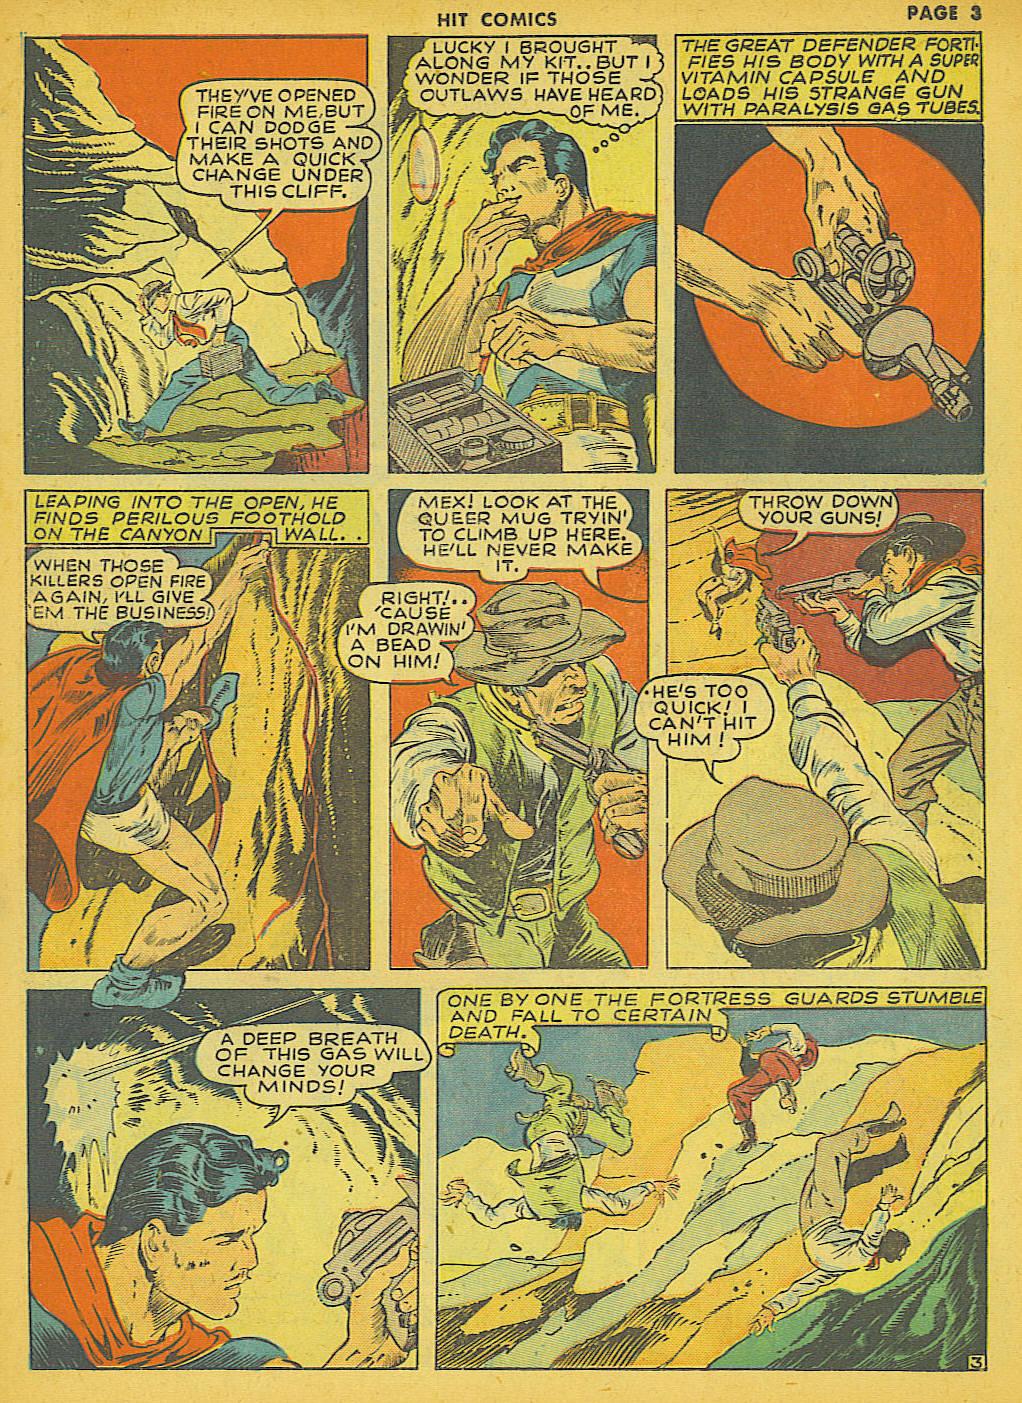 Read online Hit Comics comic -  Issue #21 - 5